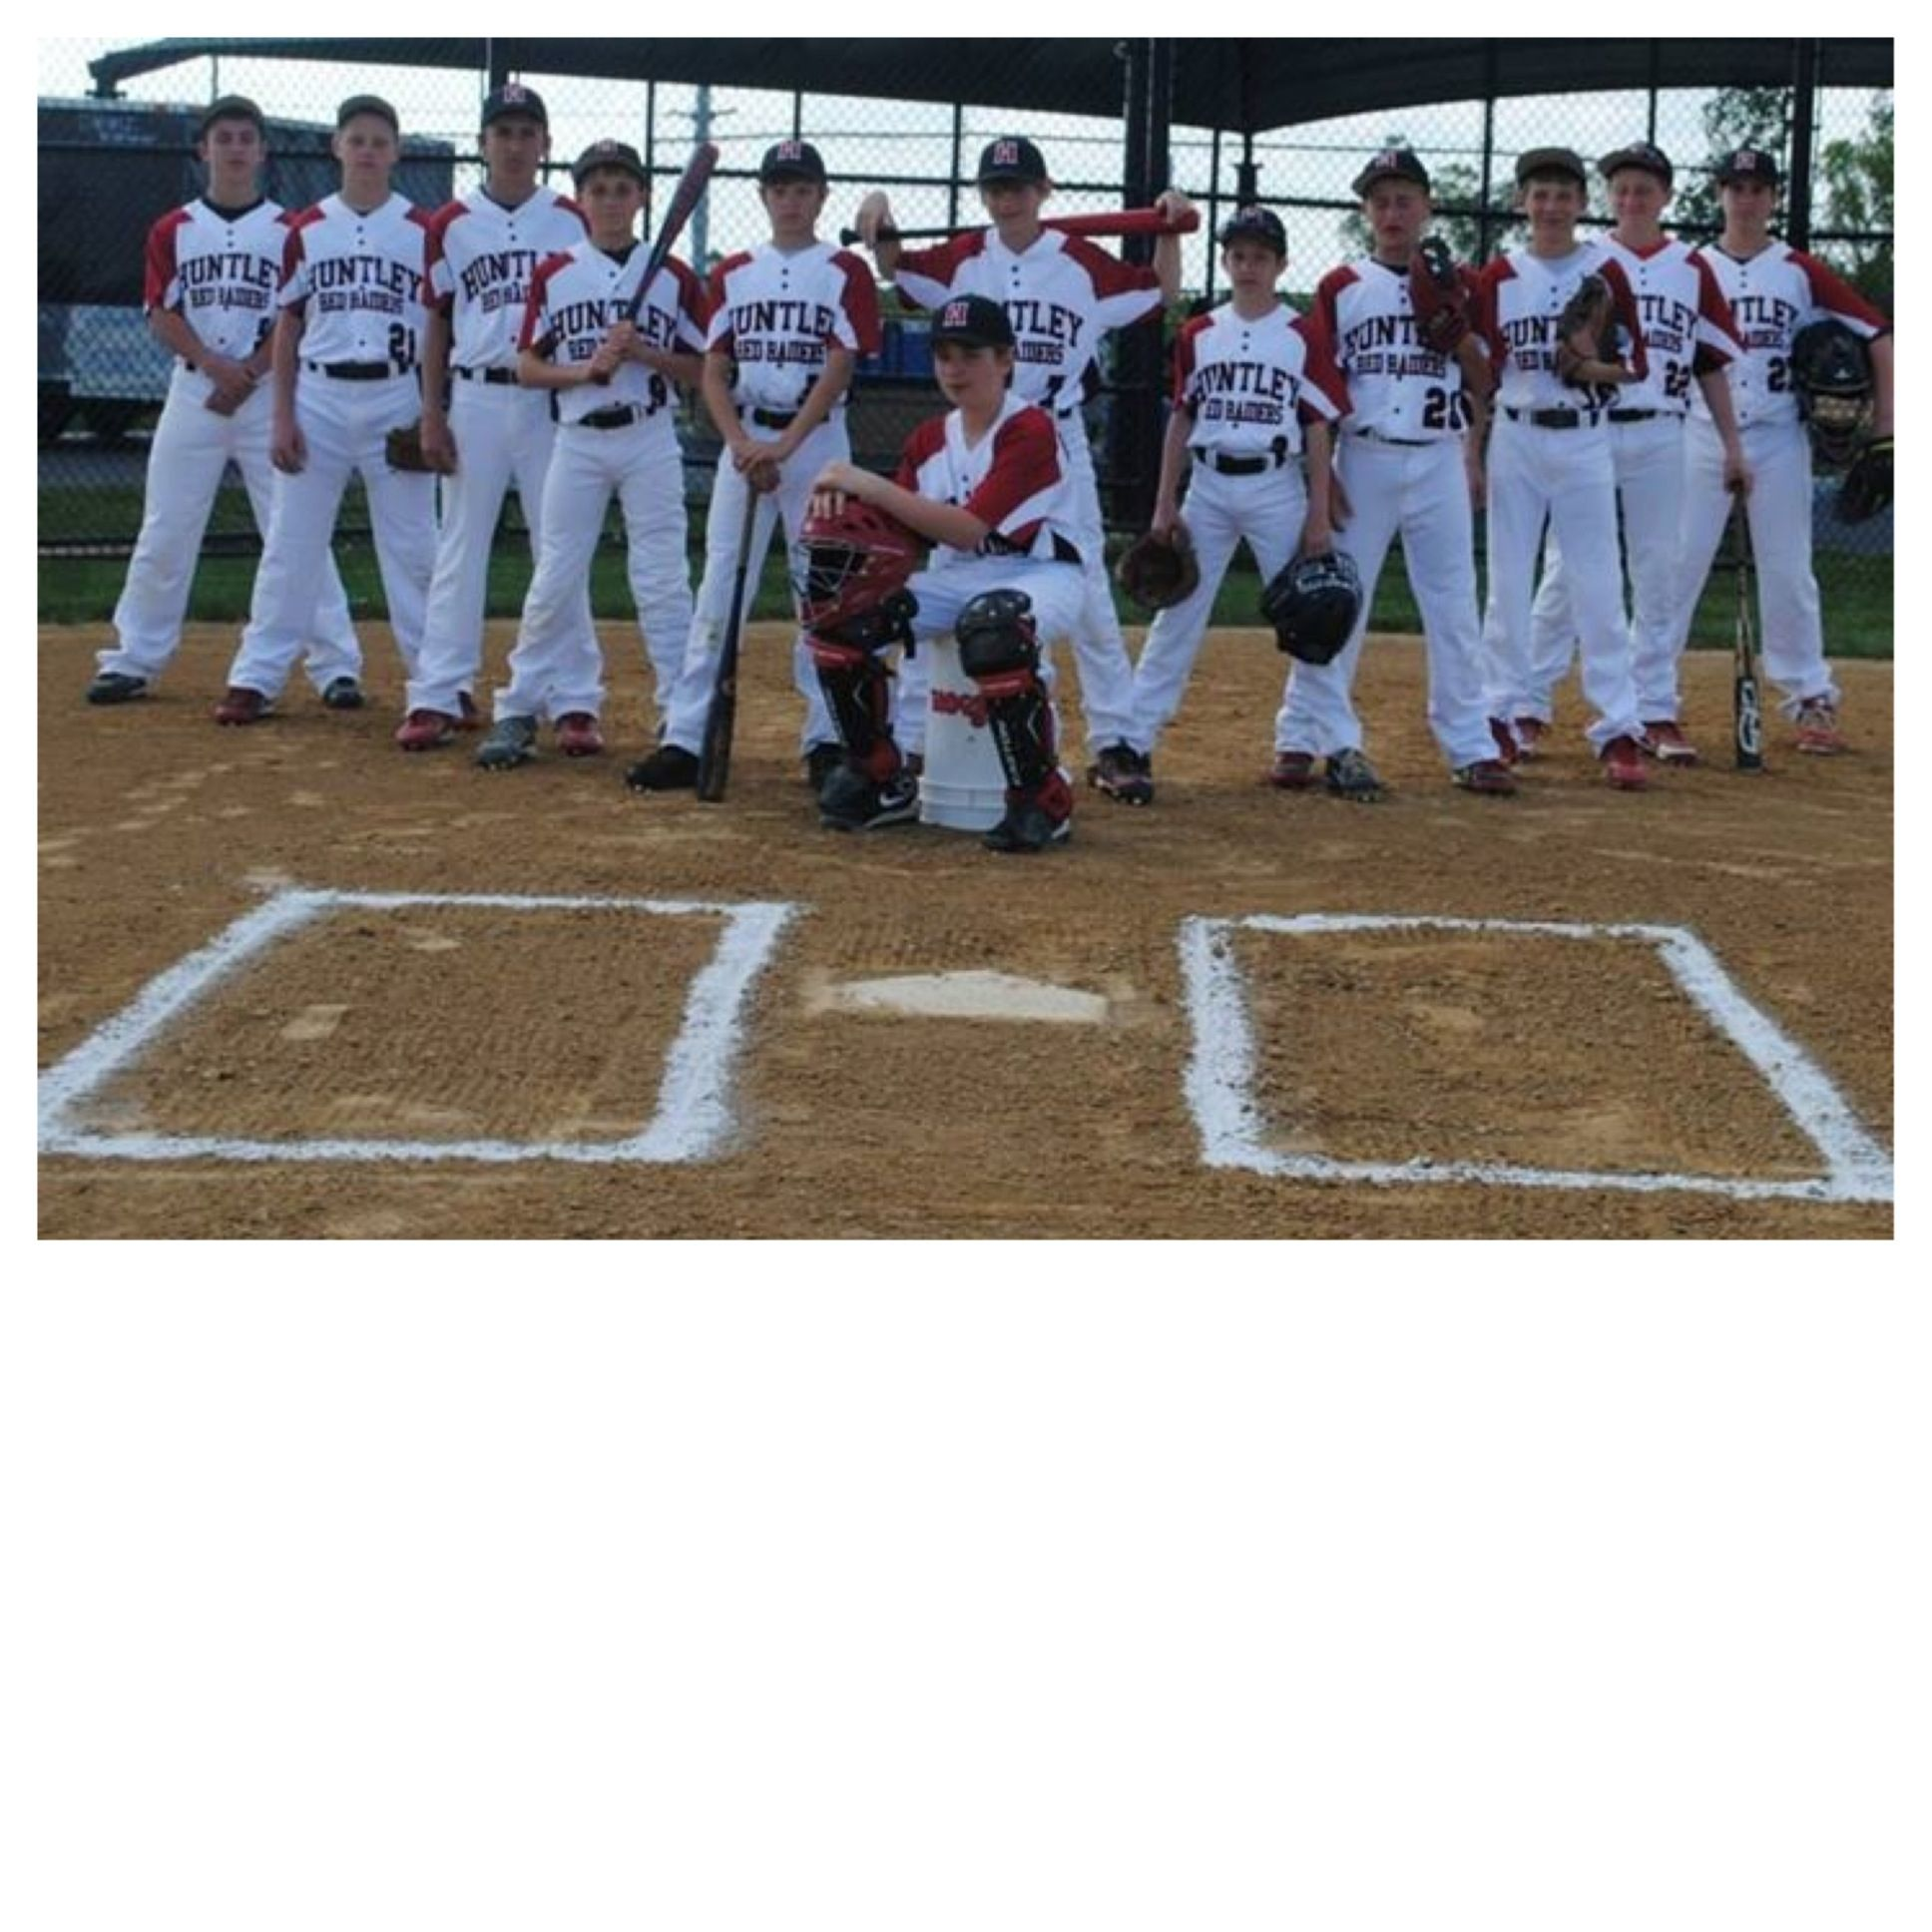 Team Picture Cute Idea For Team Photo Of A Baseball Team Banner Idea Team Pictures Baseball Photography Baseball Team Pictures